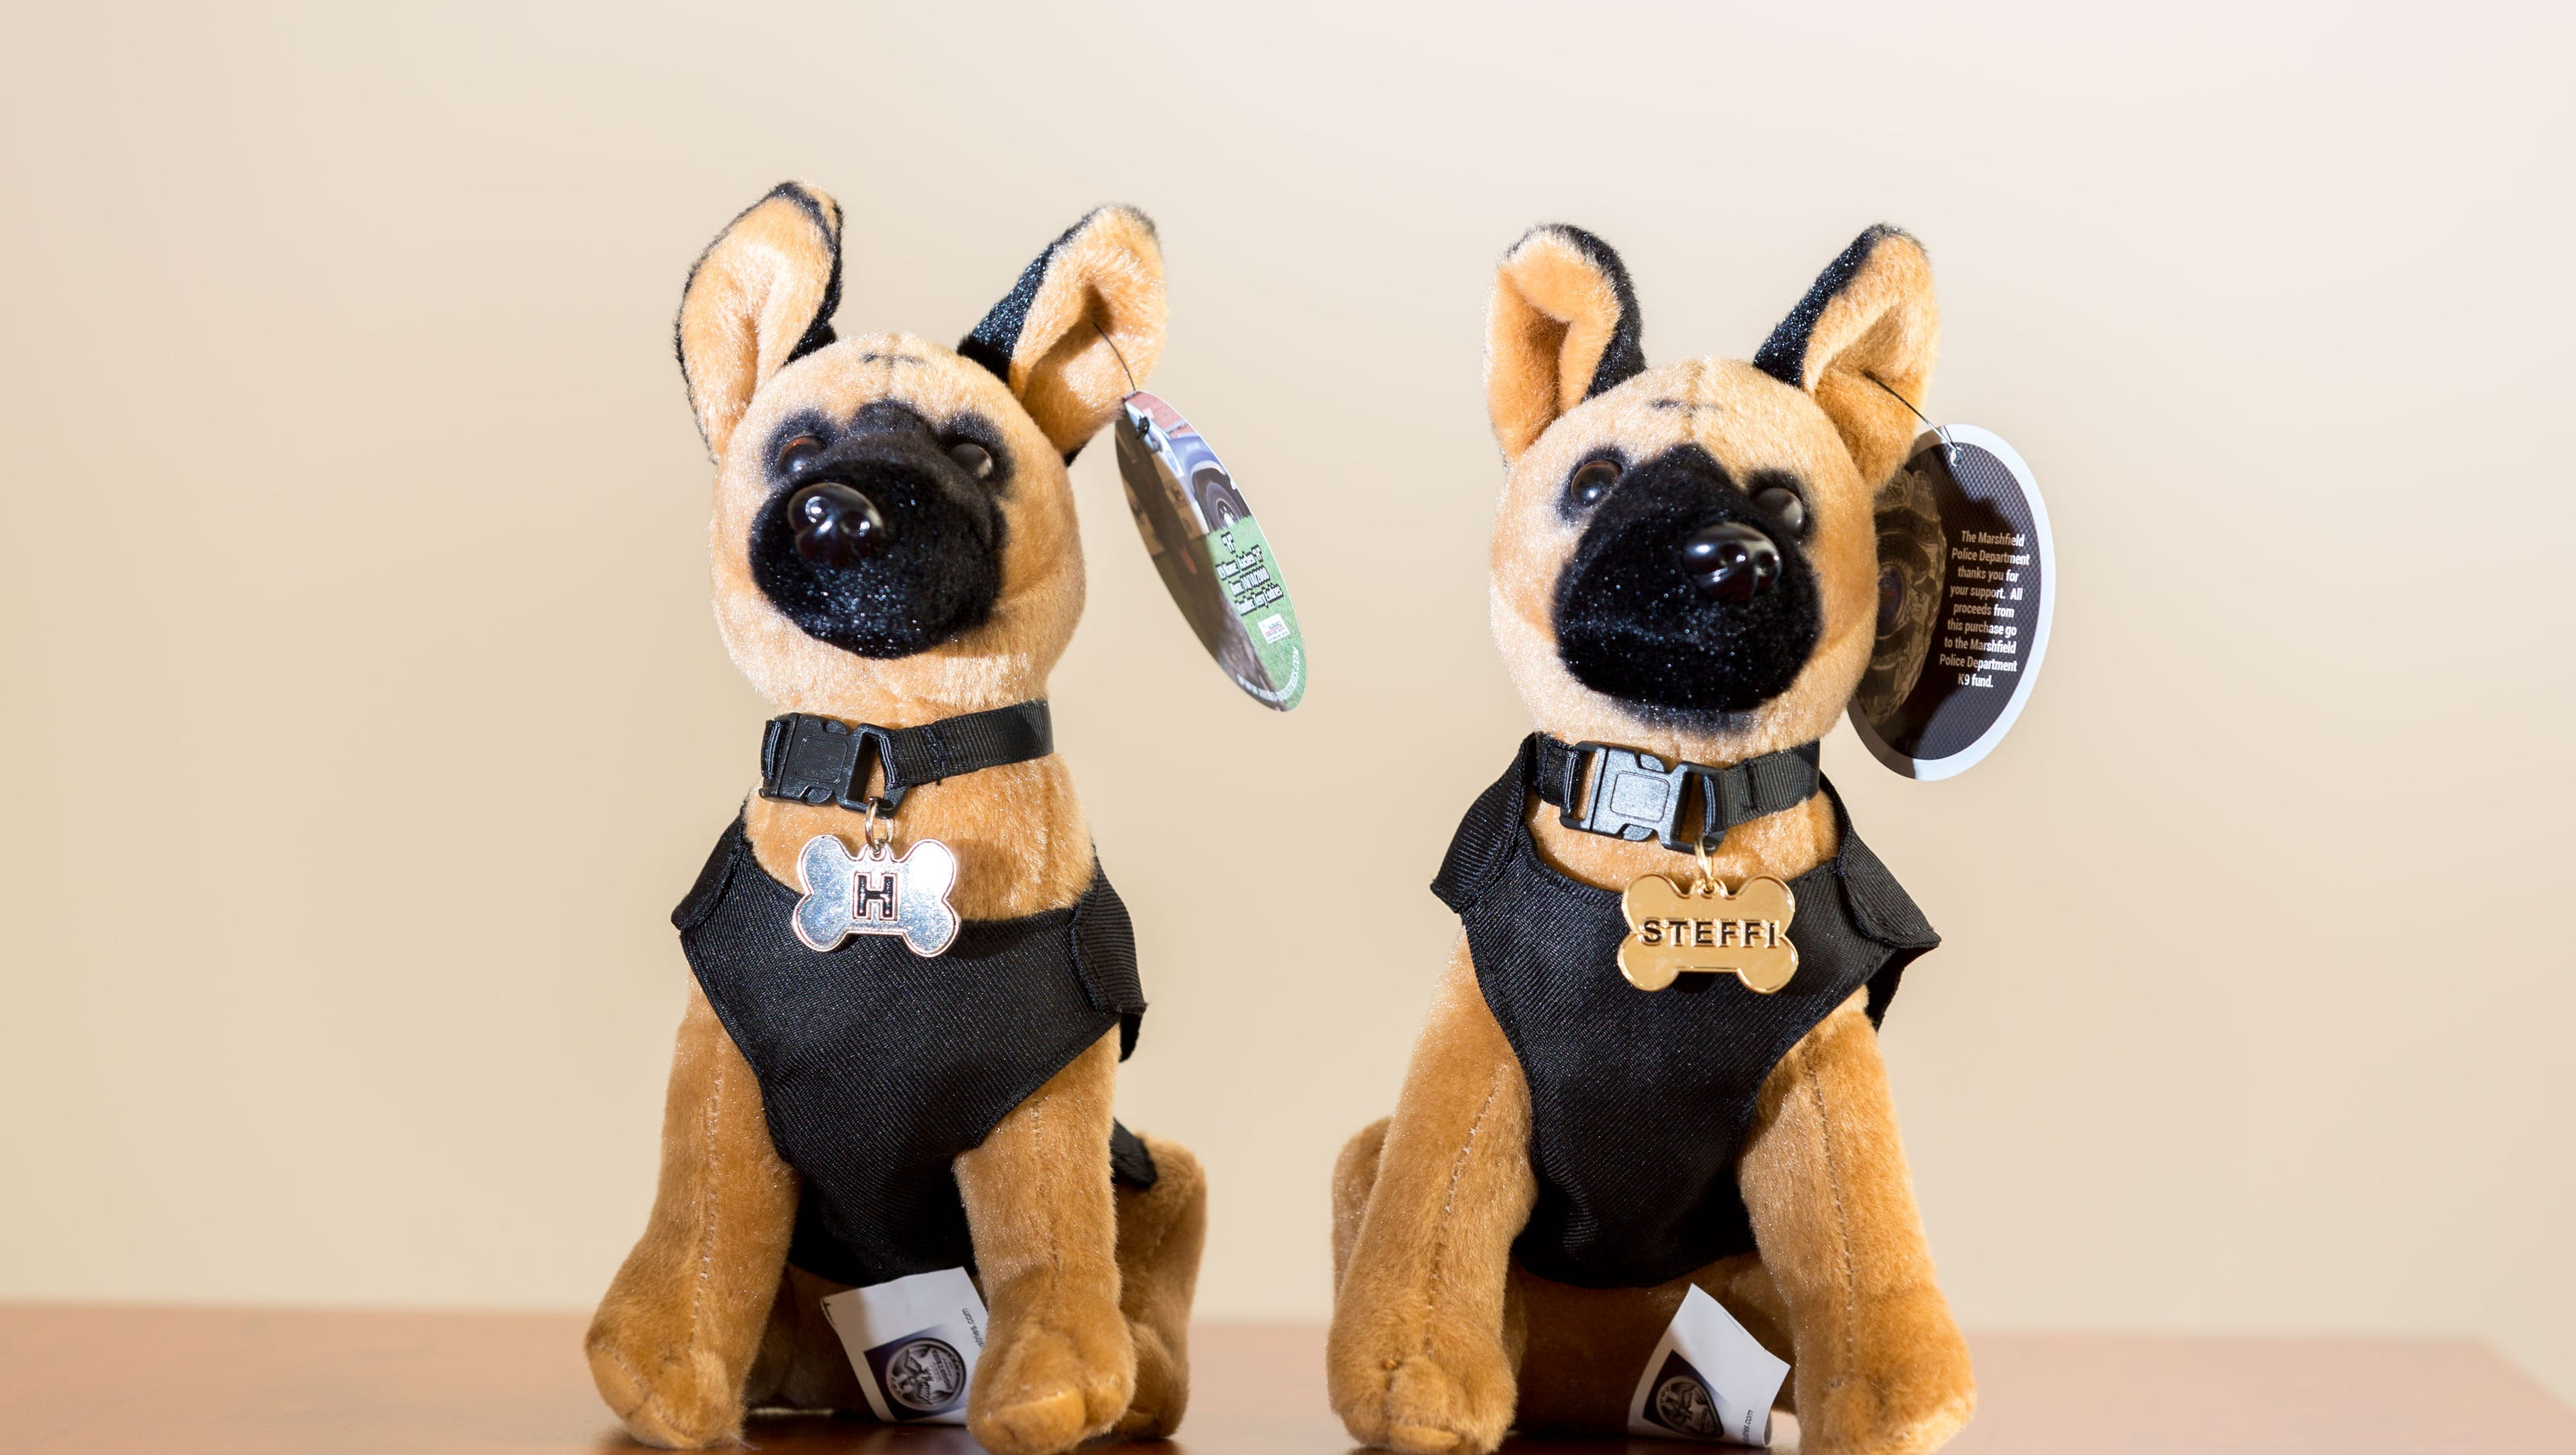 Stuffed Dogs Raise Cash For Marshfield P D